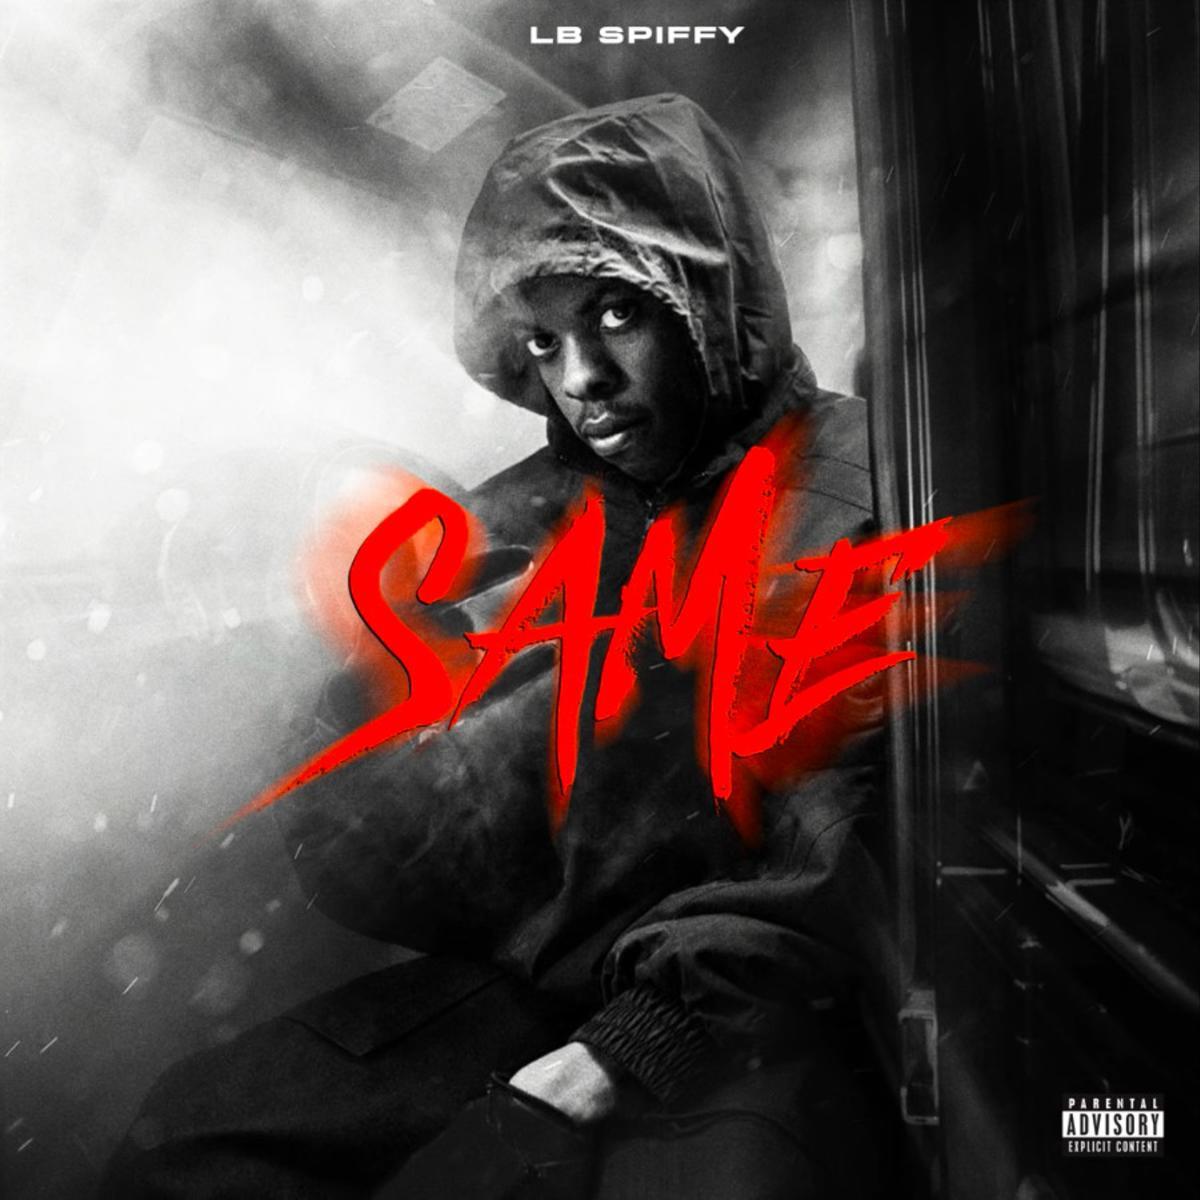 MP3: LB Spiffy - Same